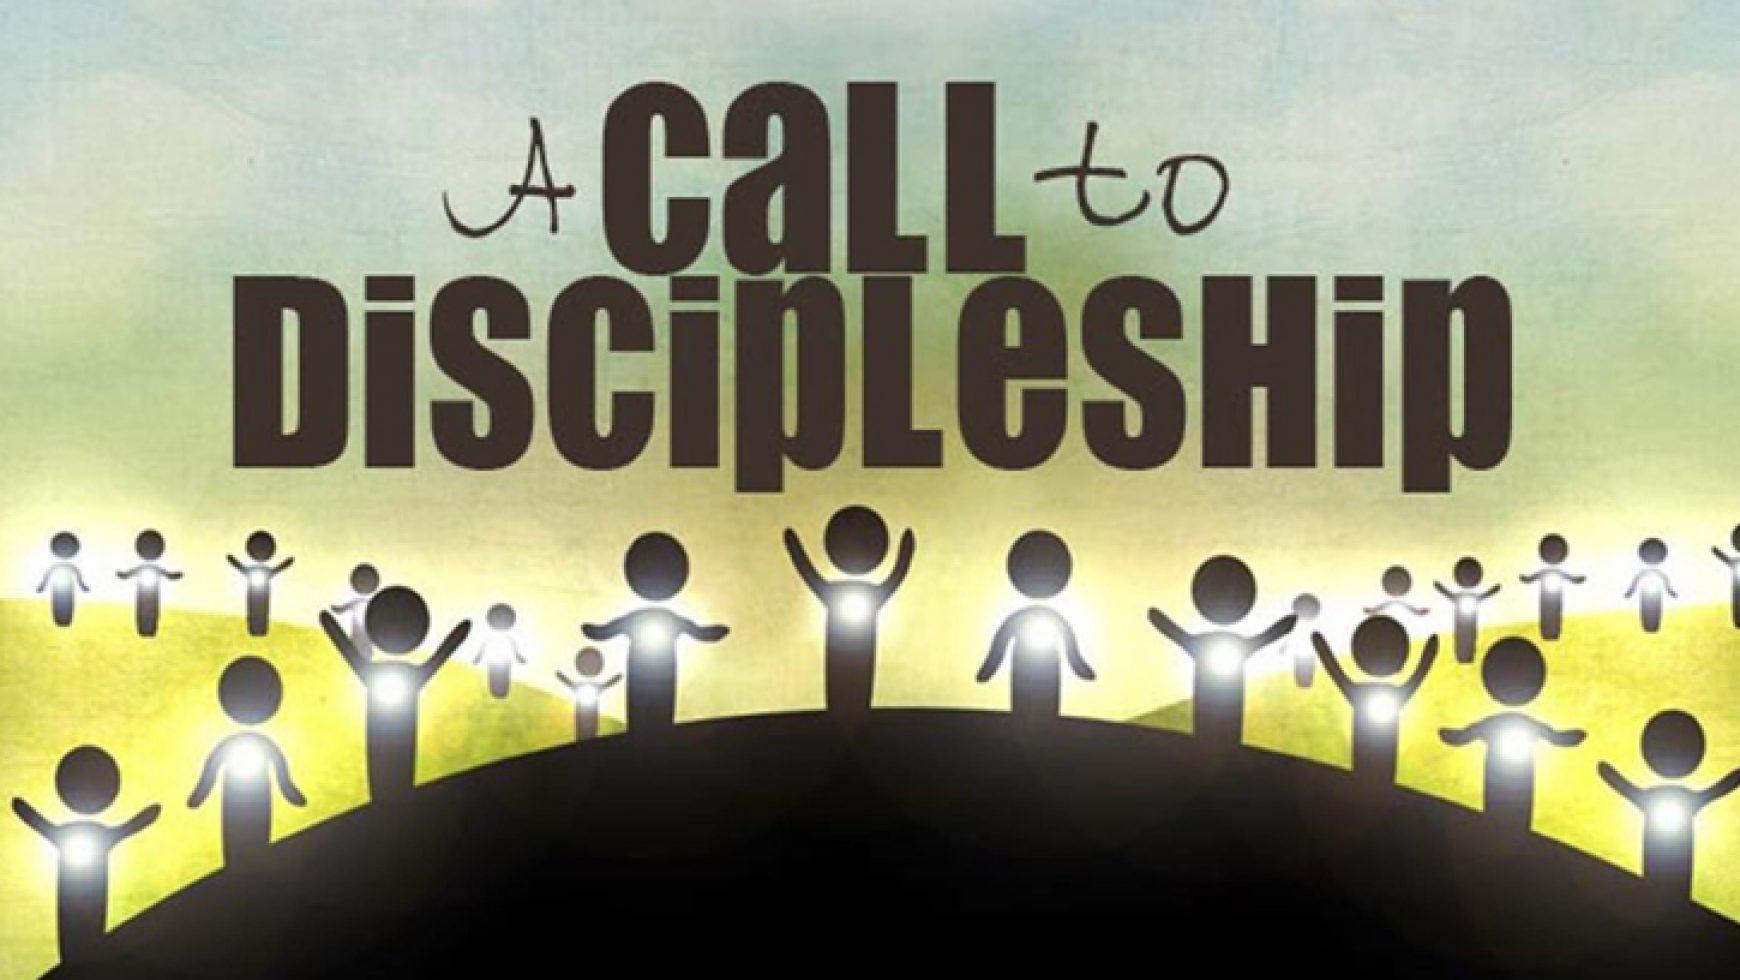 A Call to Discipleship